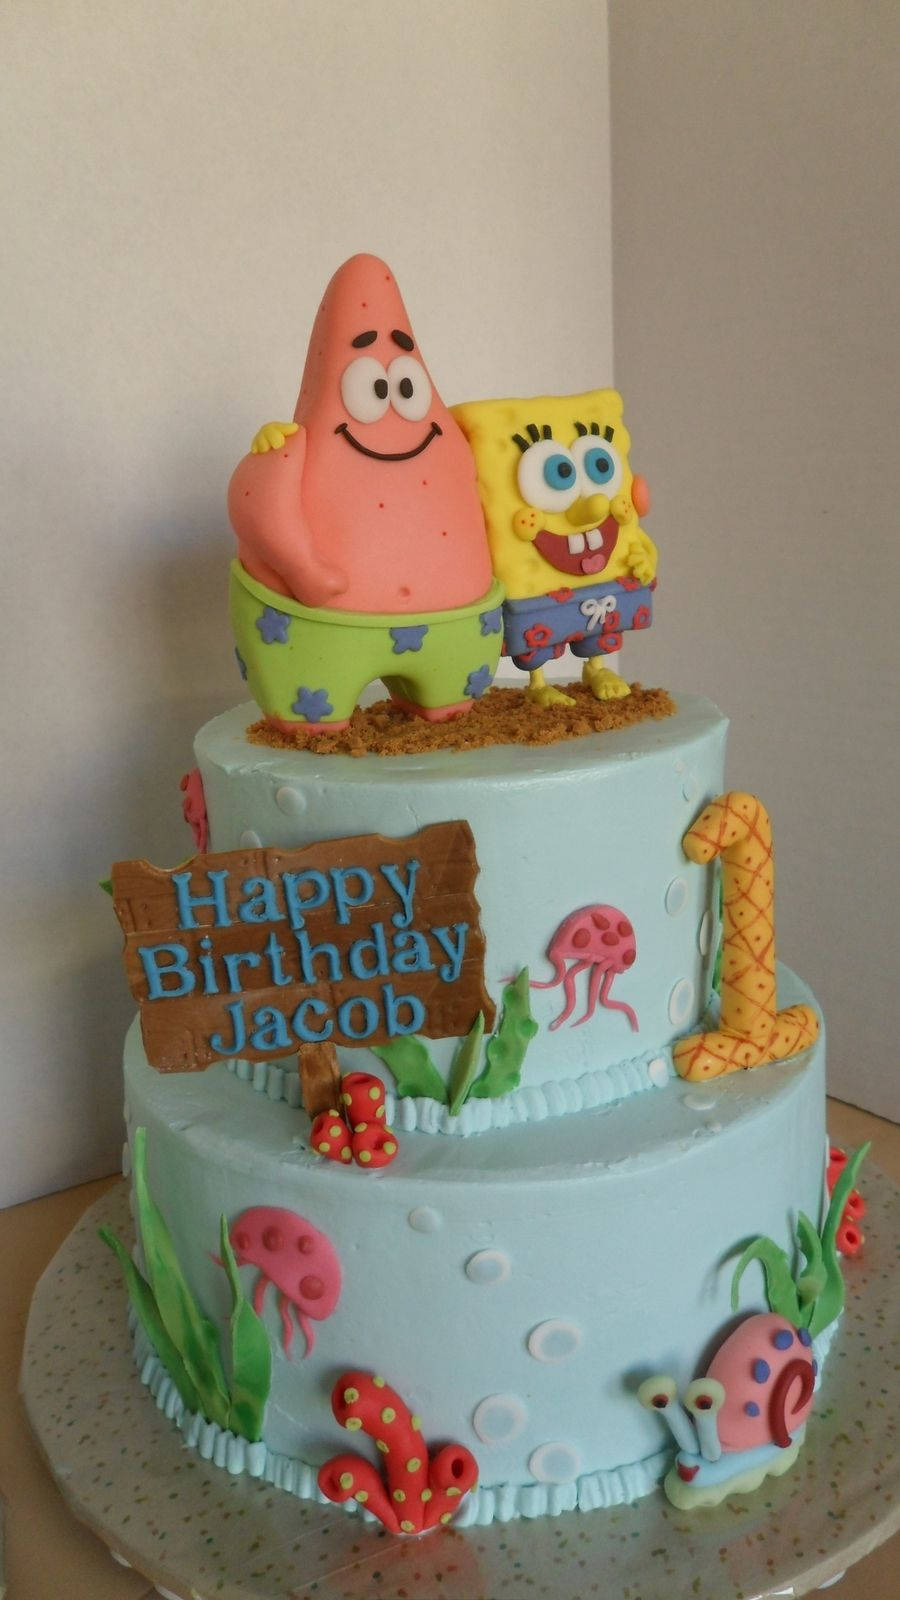 Spongebob Patrick And Gary Birthday spongebob Pinterest